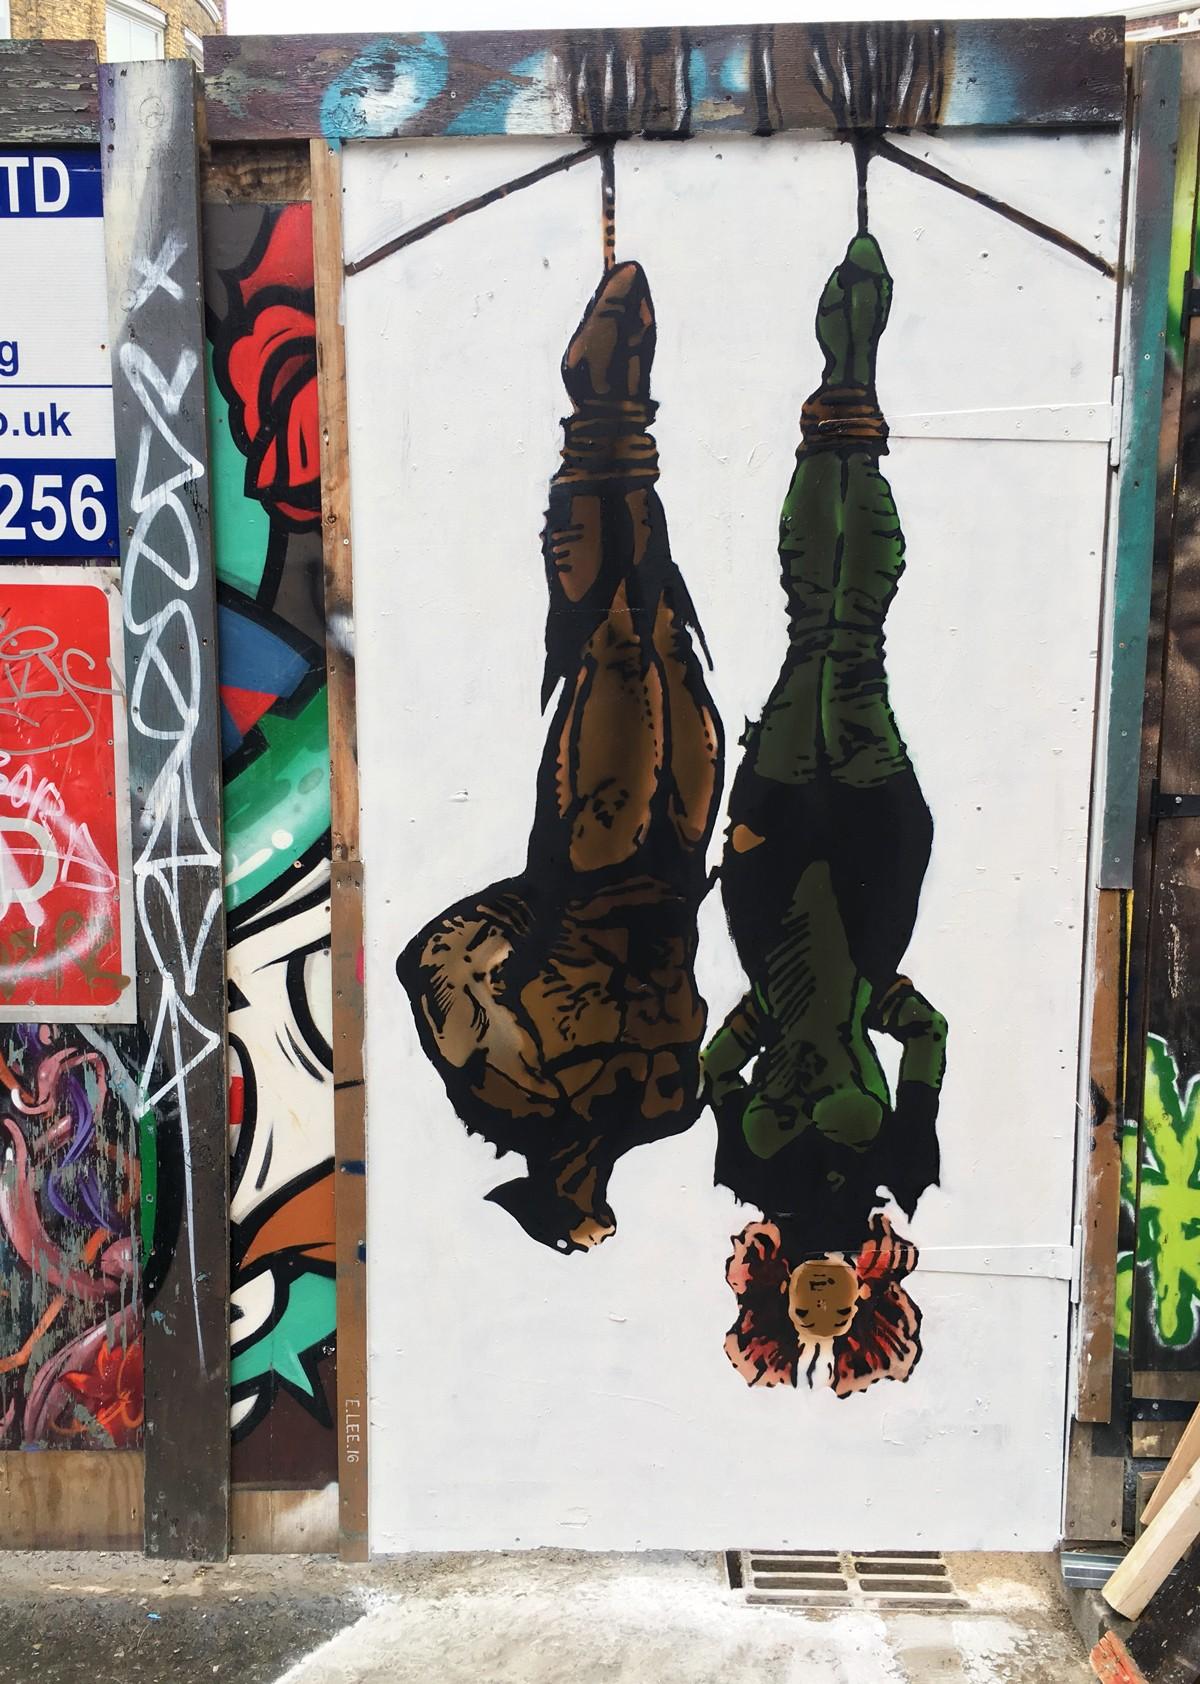 Shoreditch Street Art: E. Lee In Shoreditch, London